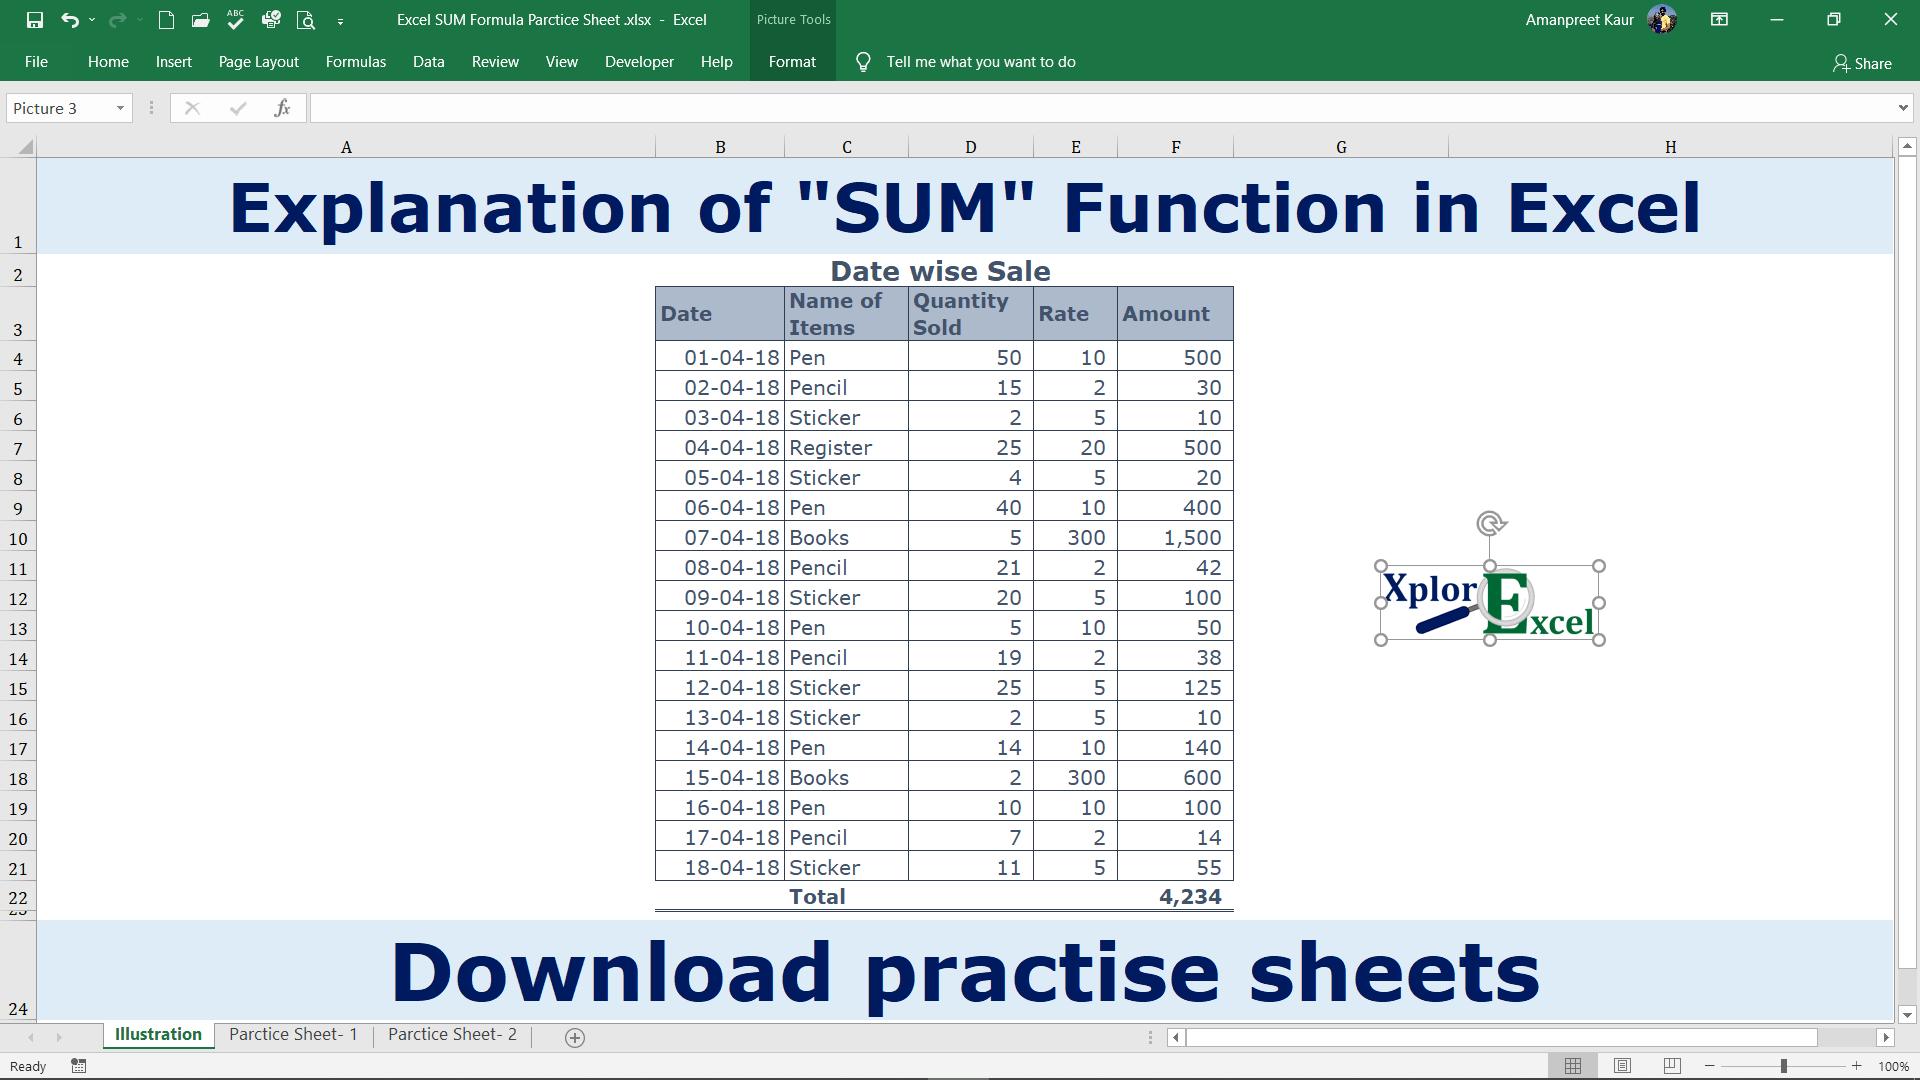 Sum Function in Excel   Download 20 Practice Sheets   Xplore Excel